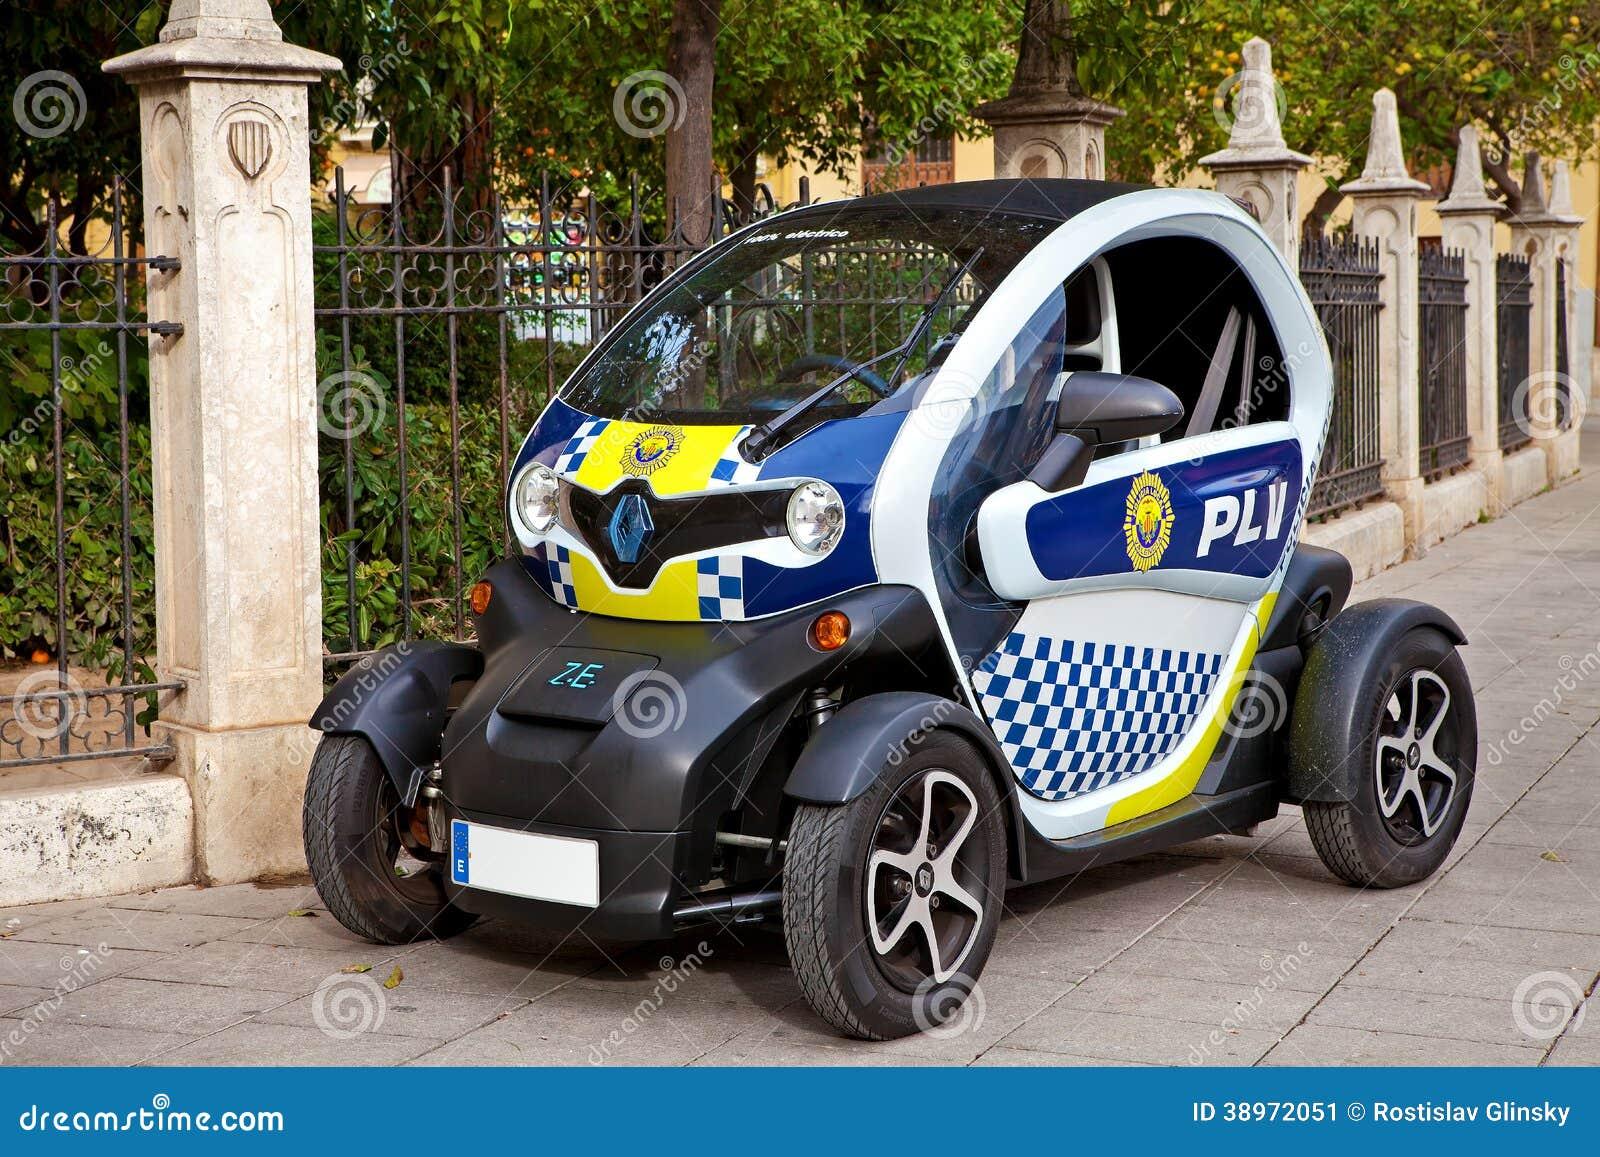 voiture de police de renault twizy valence espagne photo ditorial image du europ en. Black Bedroom Furniture Sets. Home Design Ideas